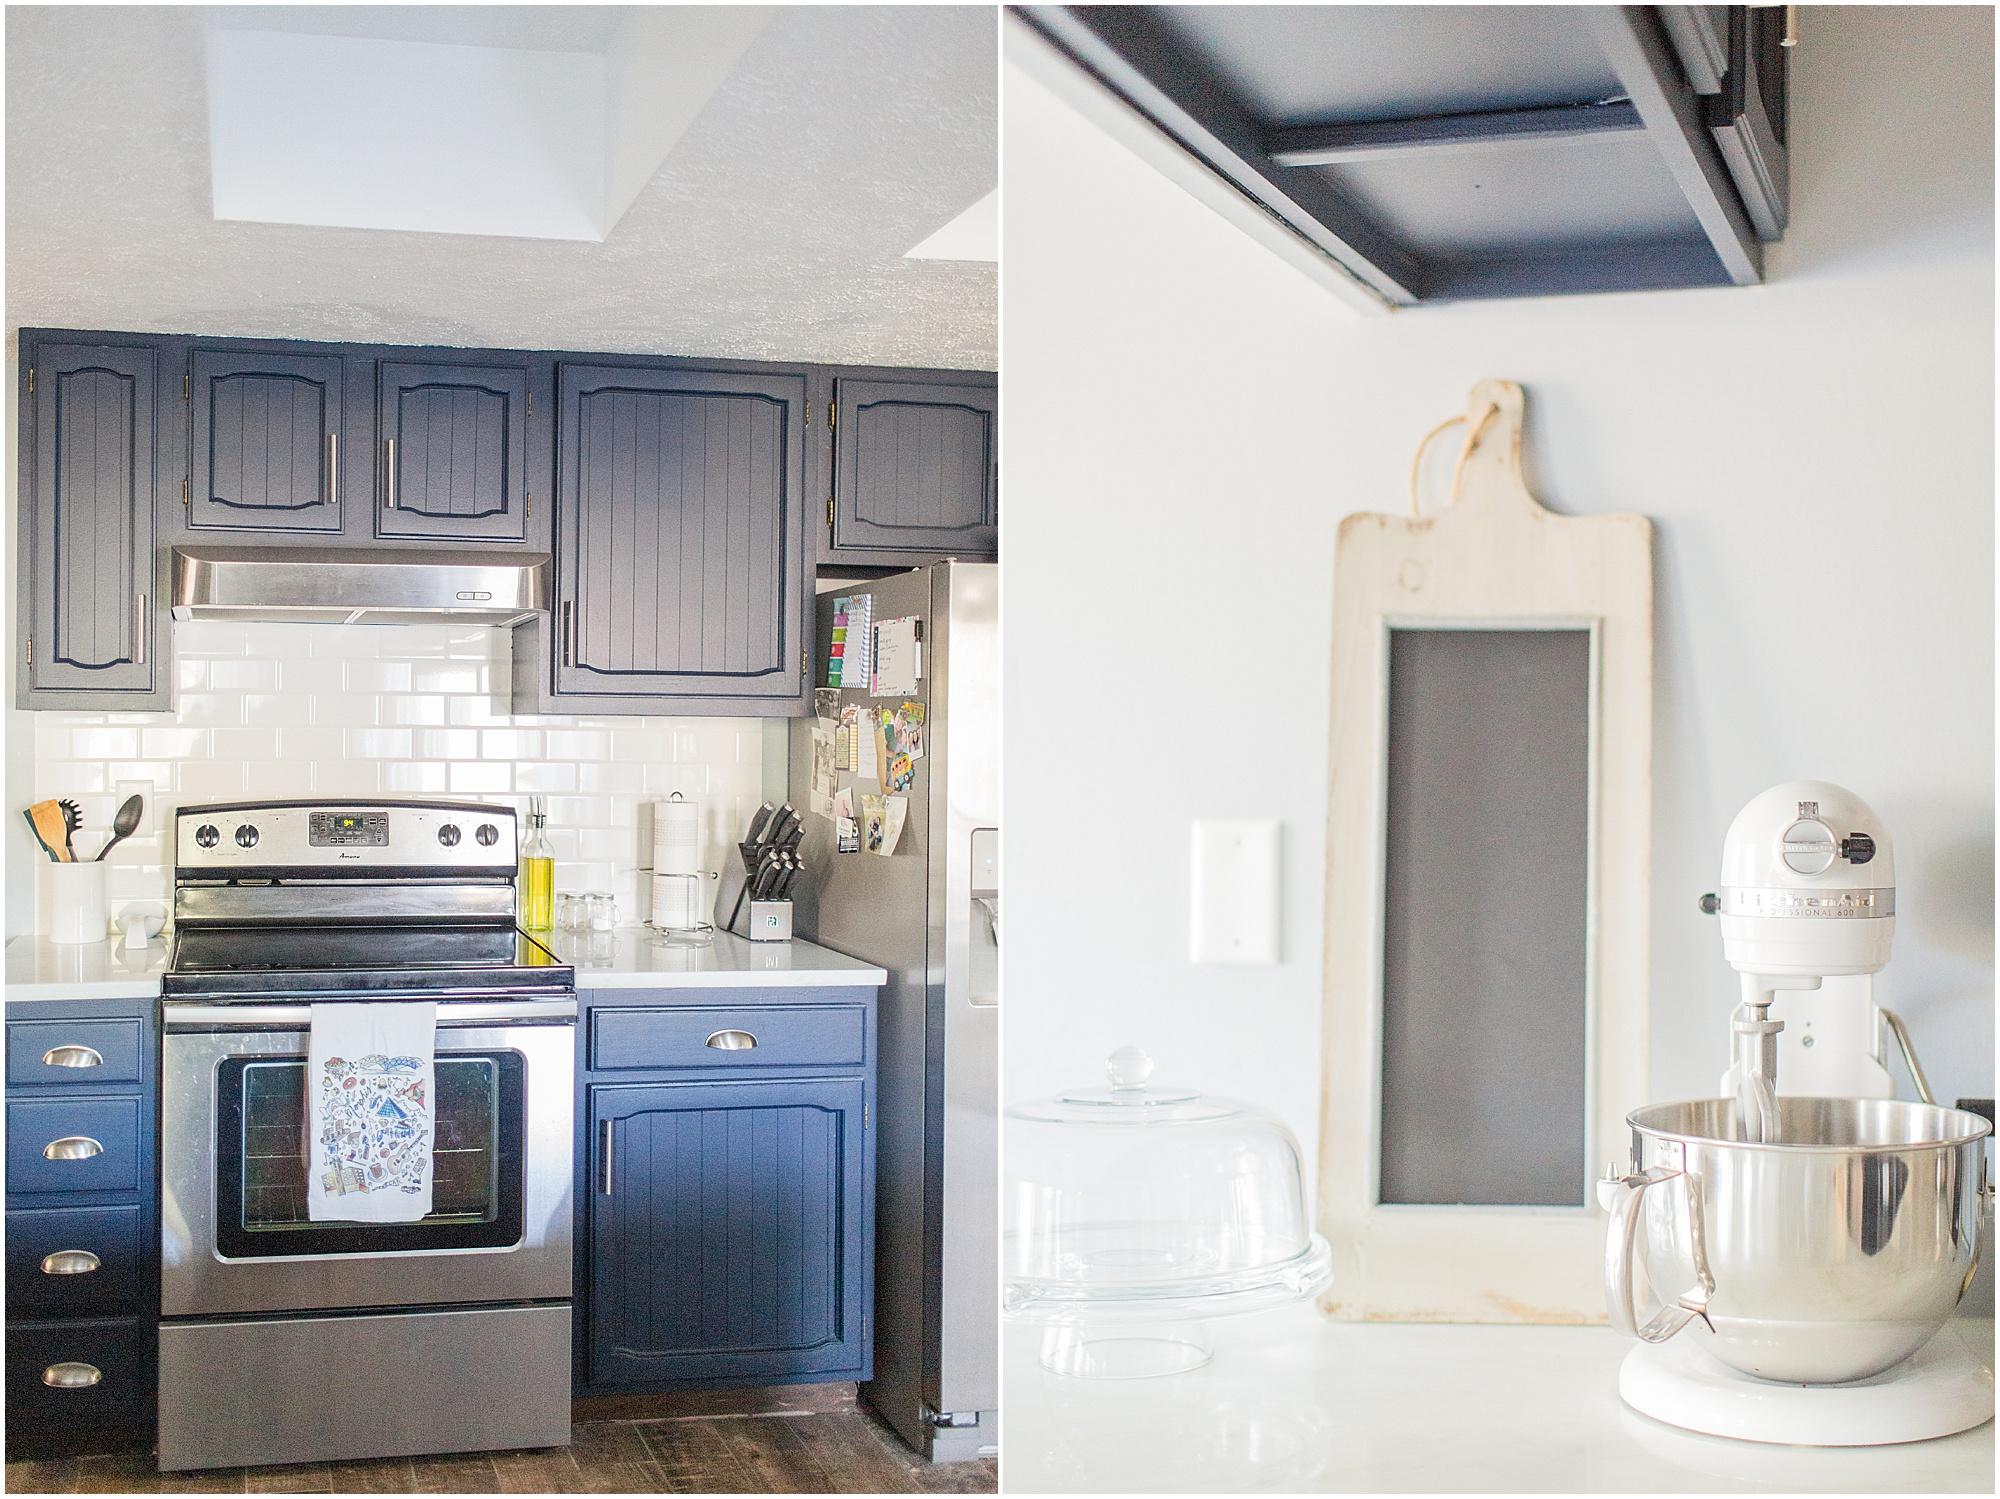 hambick-house-kitchen-renovation-fixer-upper_0024.jpg